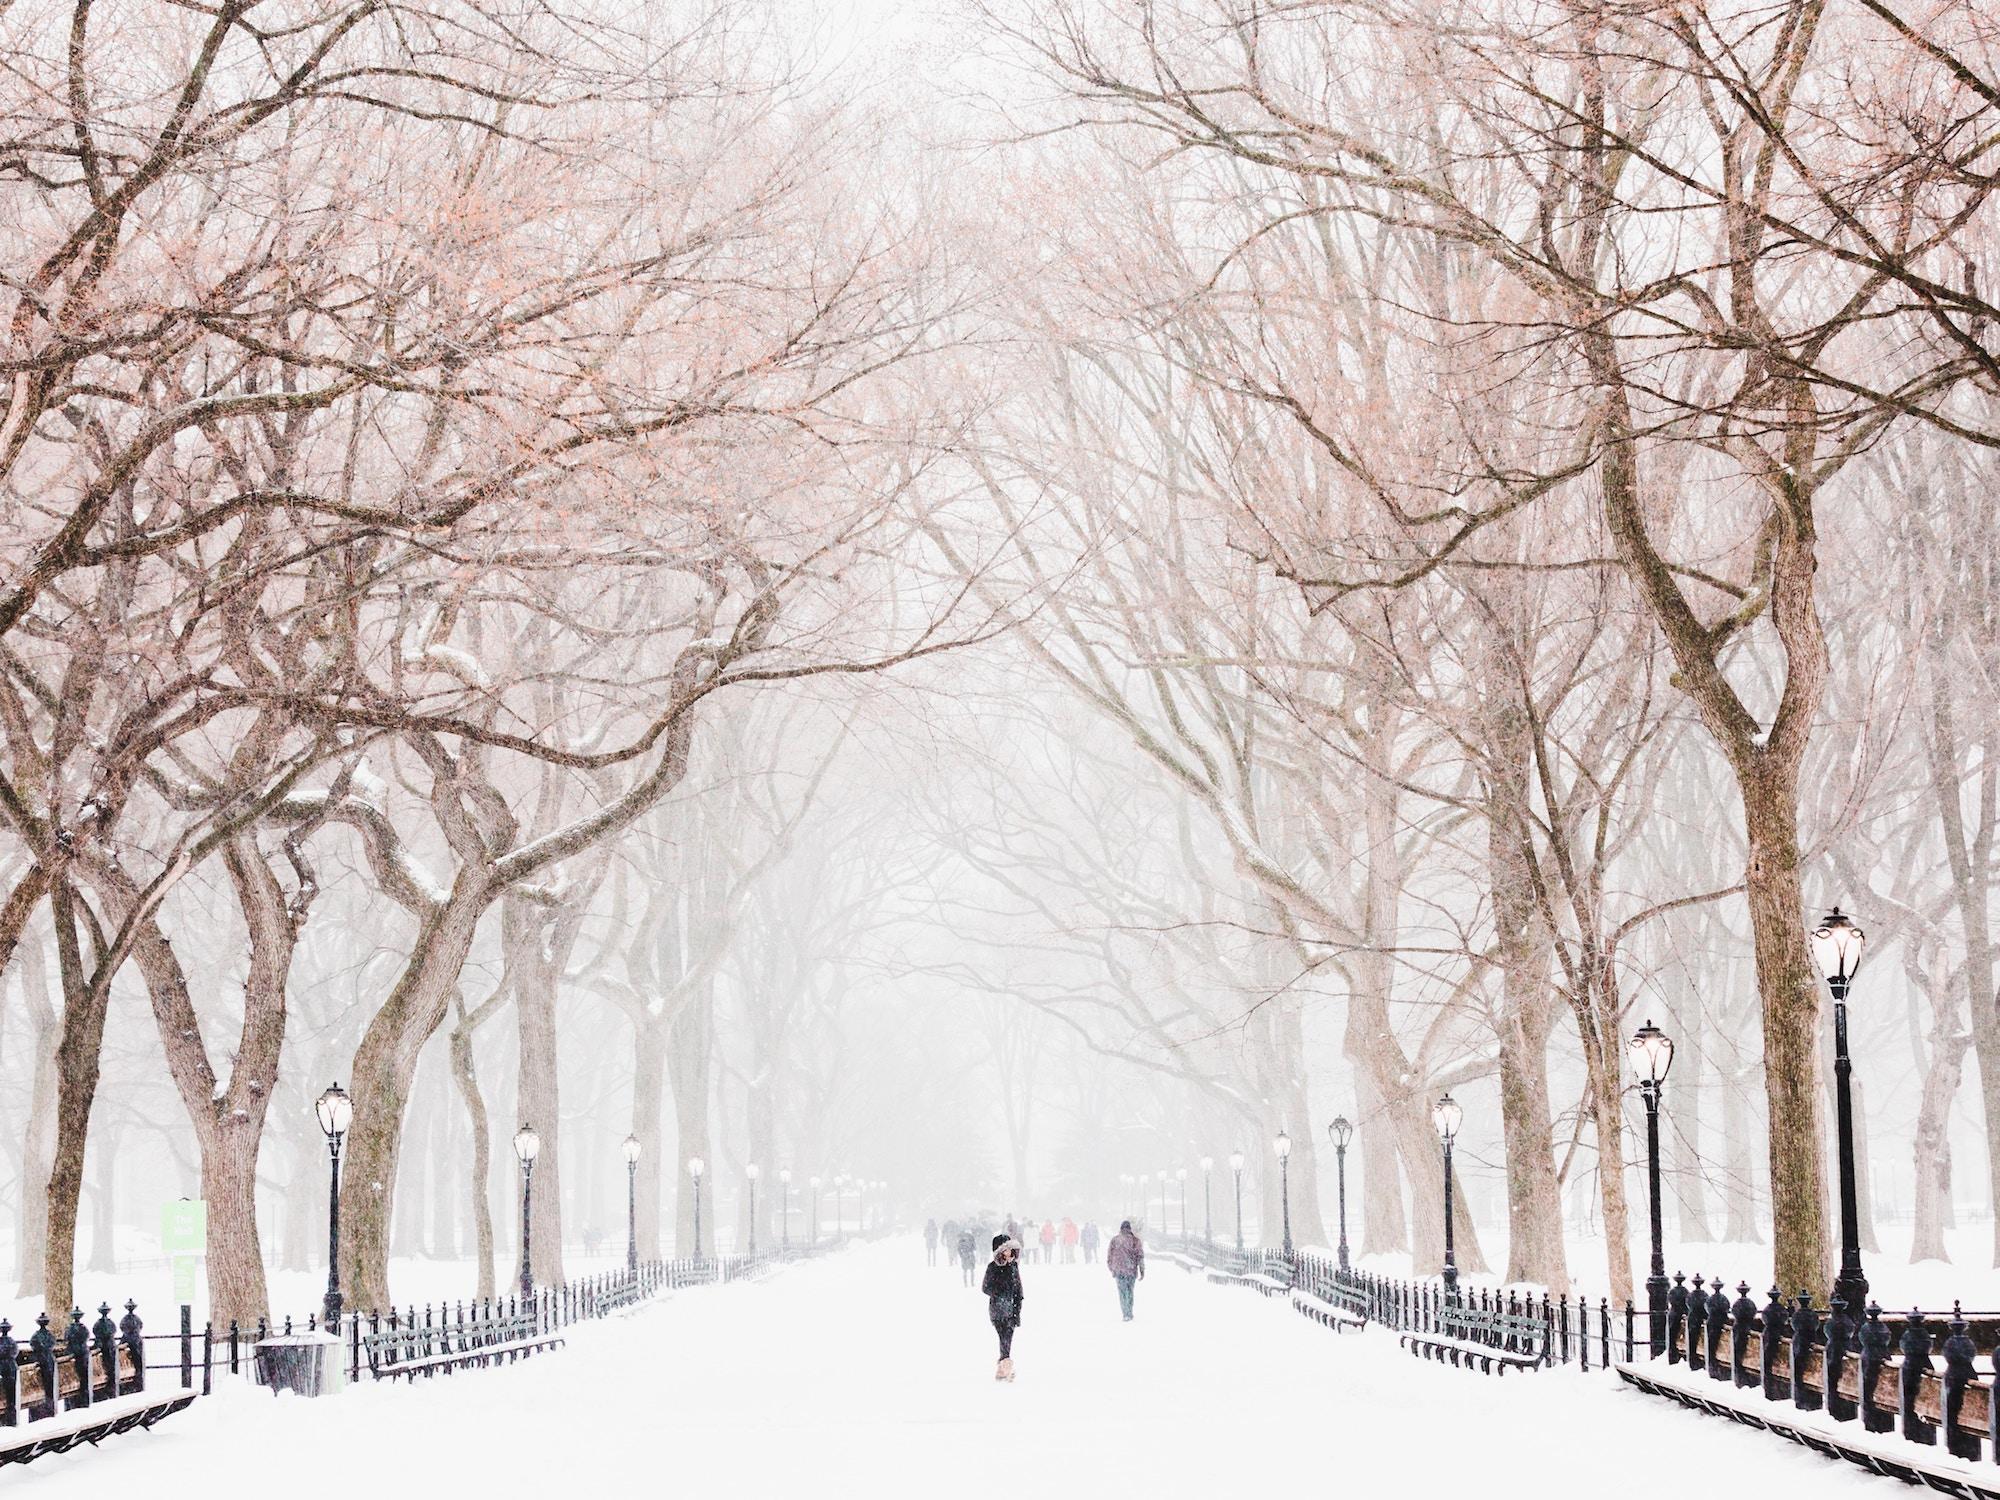 winter storm illustration